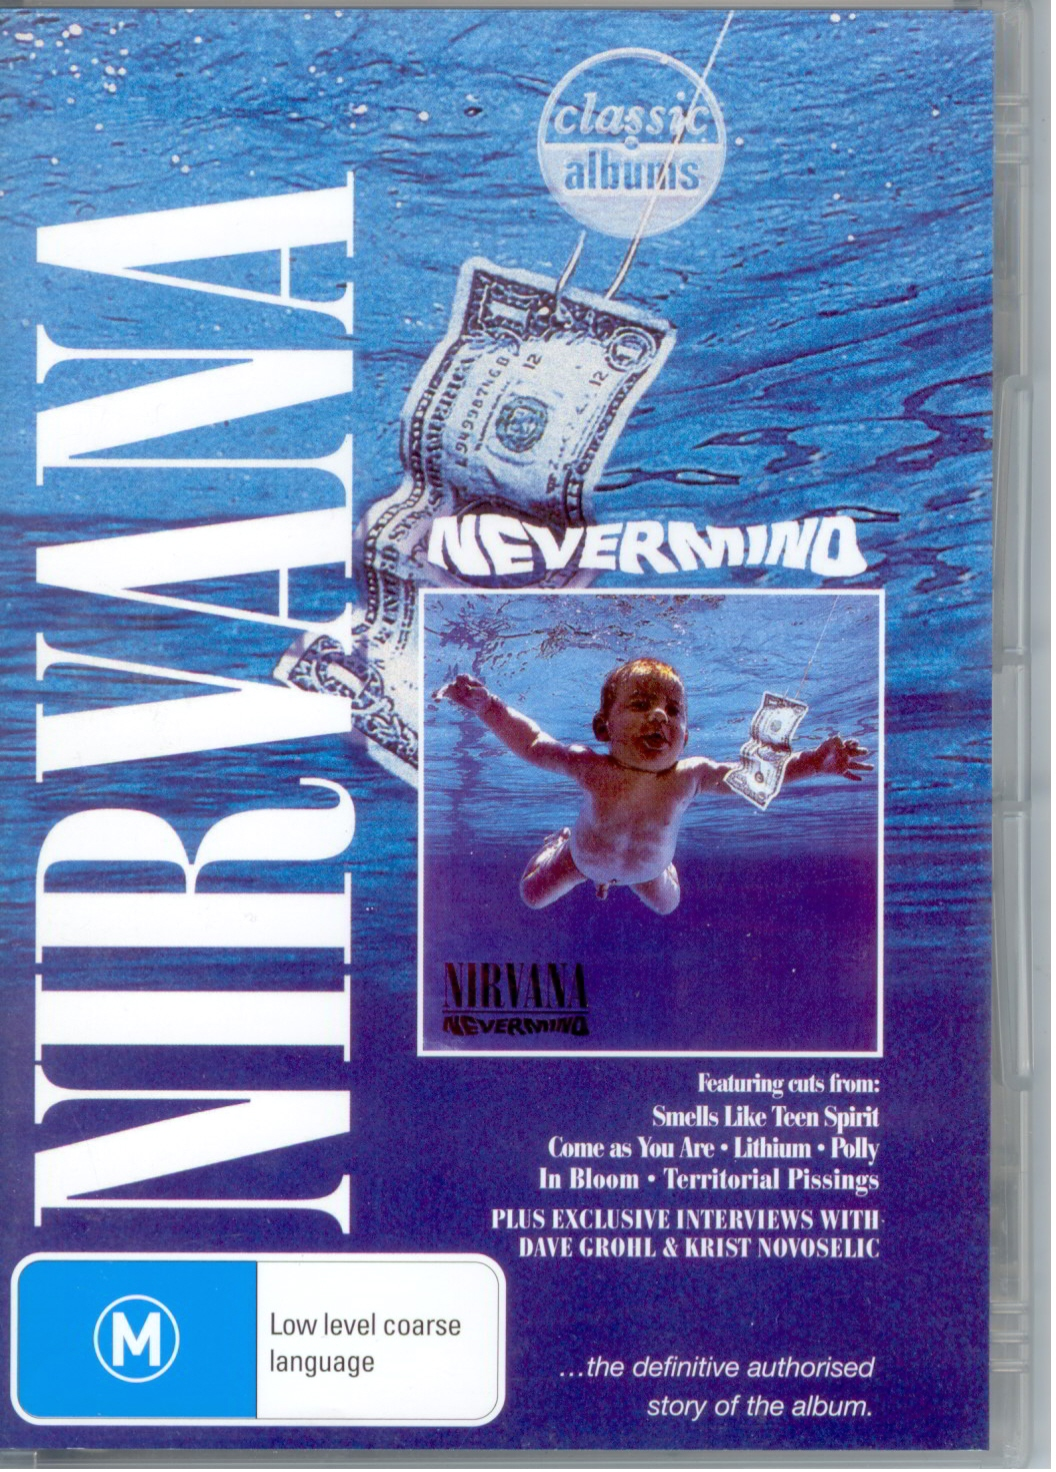 Documentales - Página 12 Nirvana-Nevermind-A-Classic-Album-M